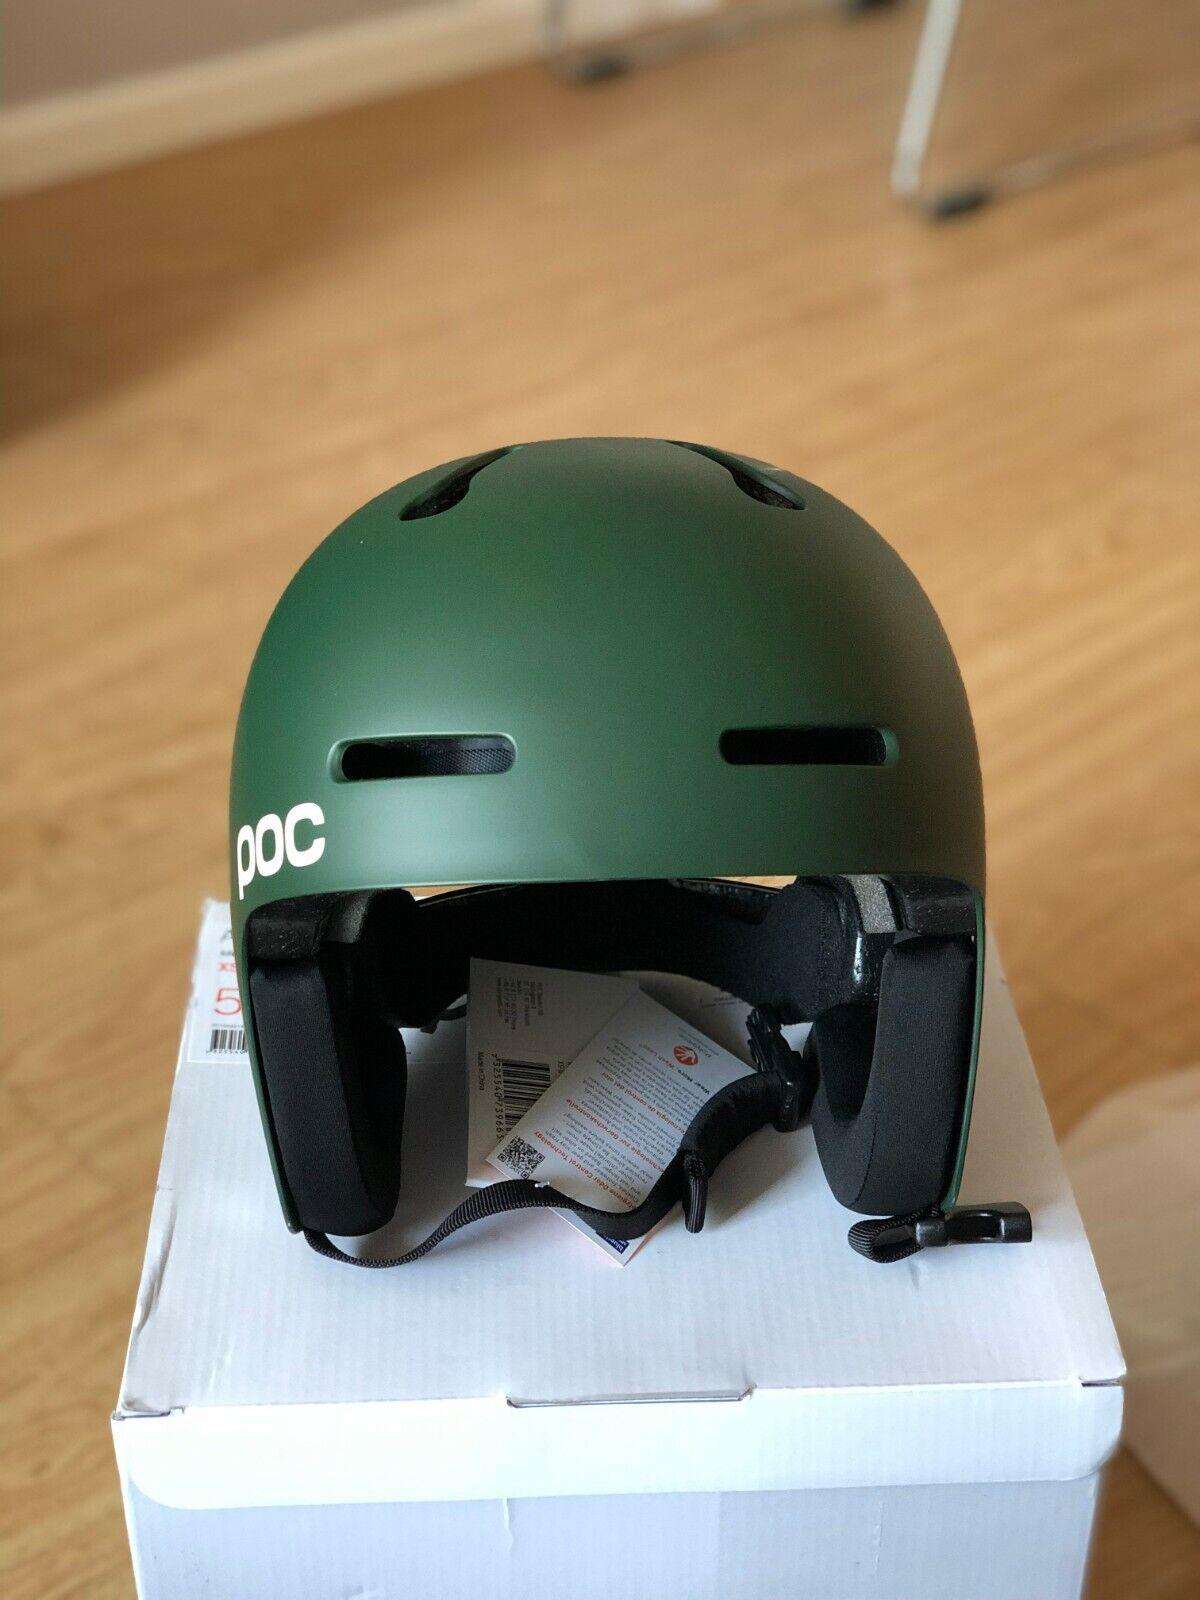 Cycle\Snowboard\Ski POC Helmet Auric Methane Green Size XS-S